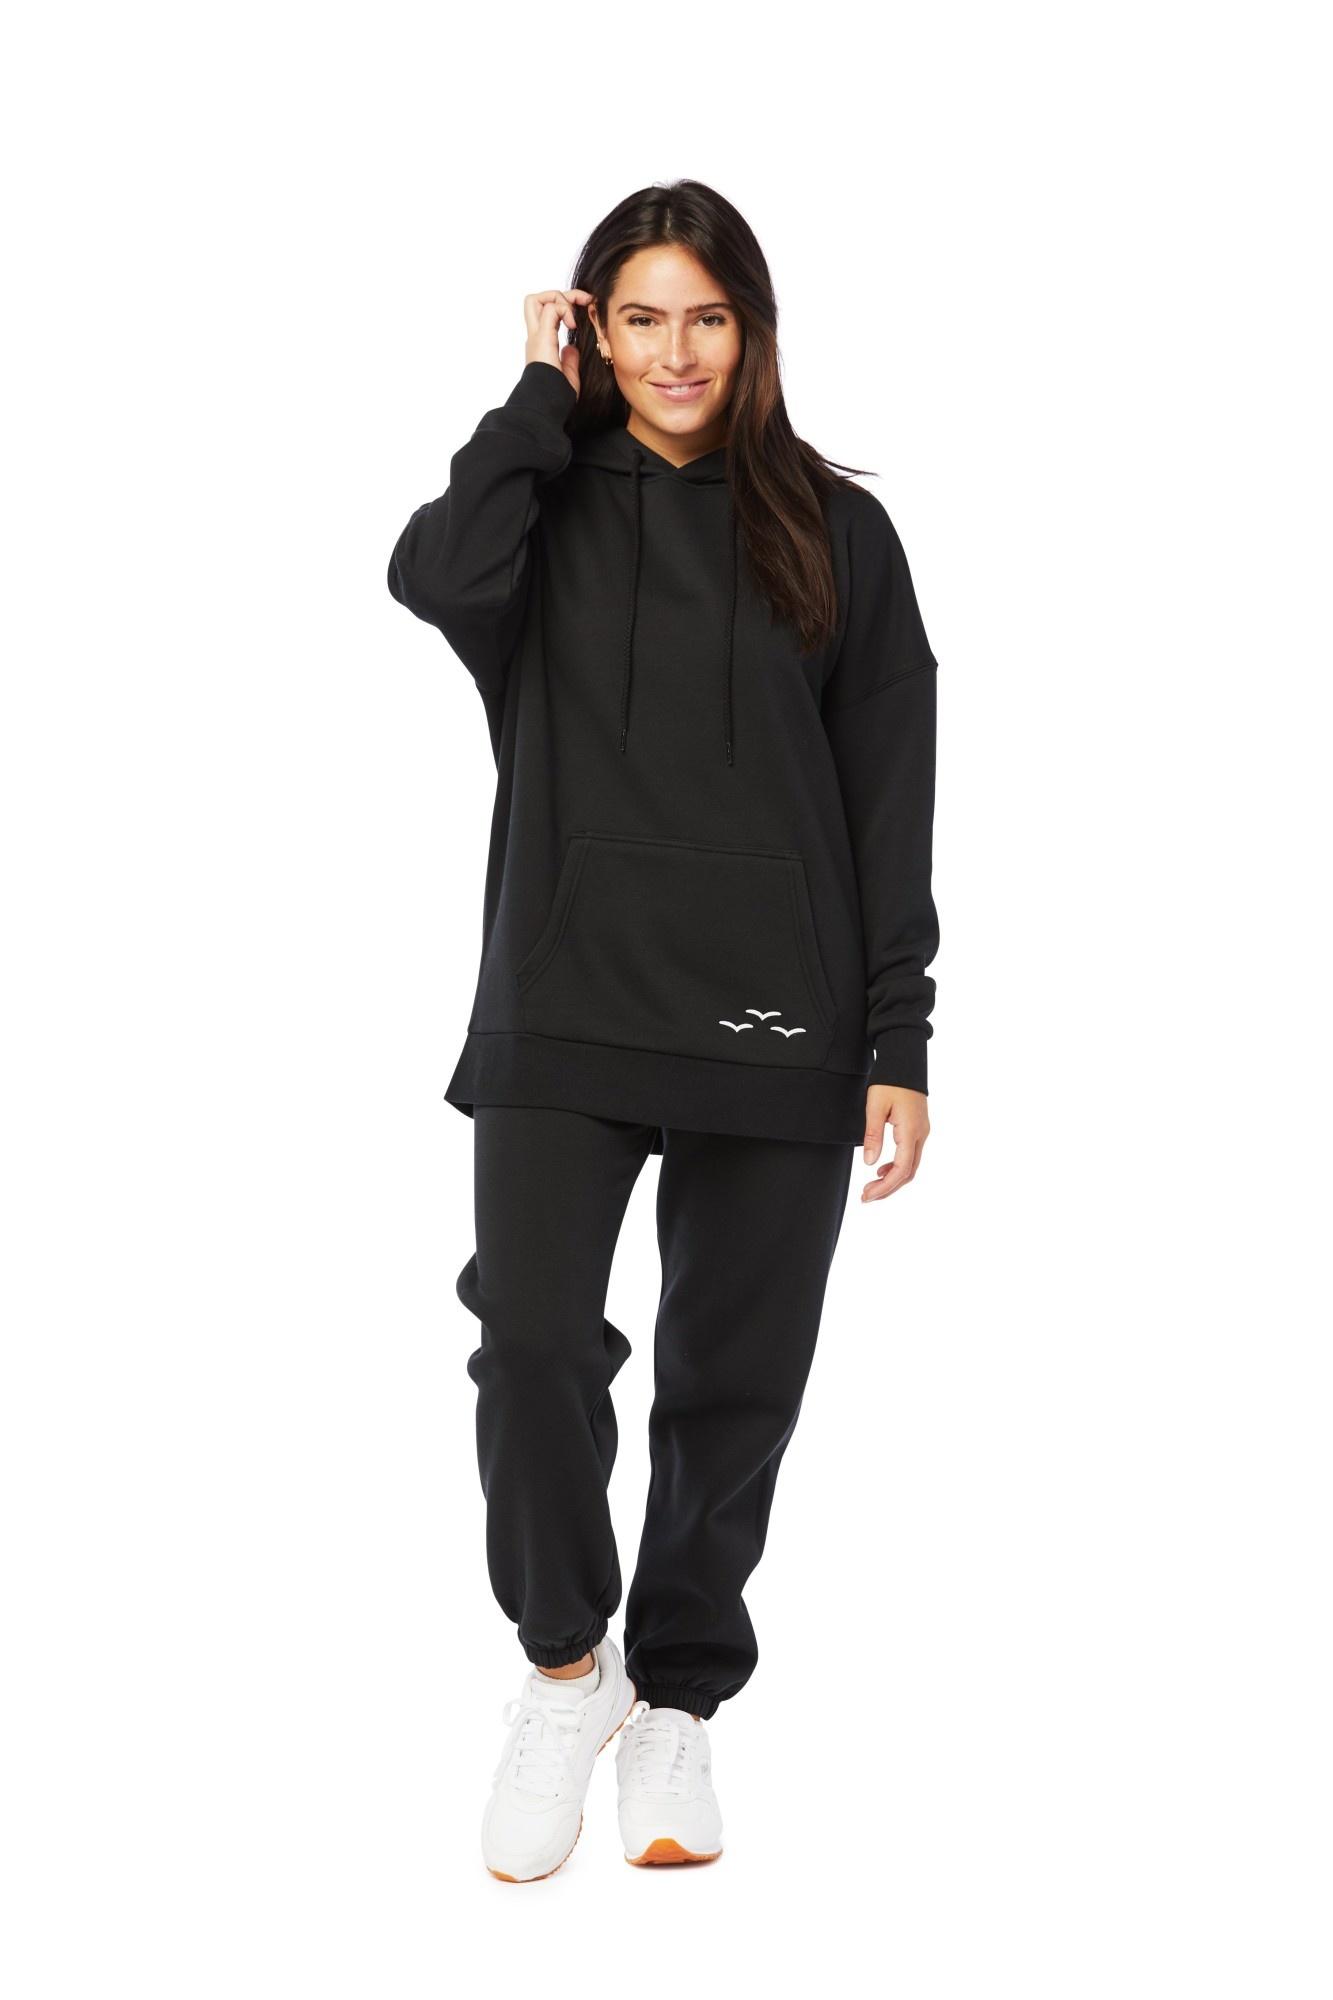 LAZYPANTS Niki & Cooper fleece set in black